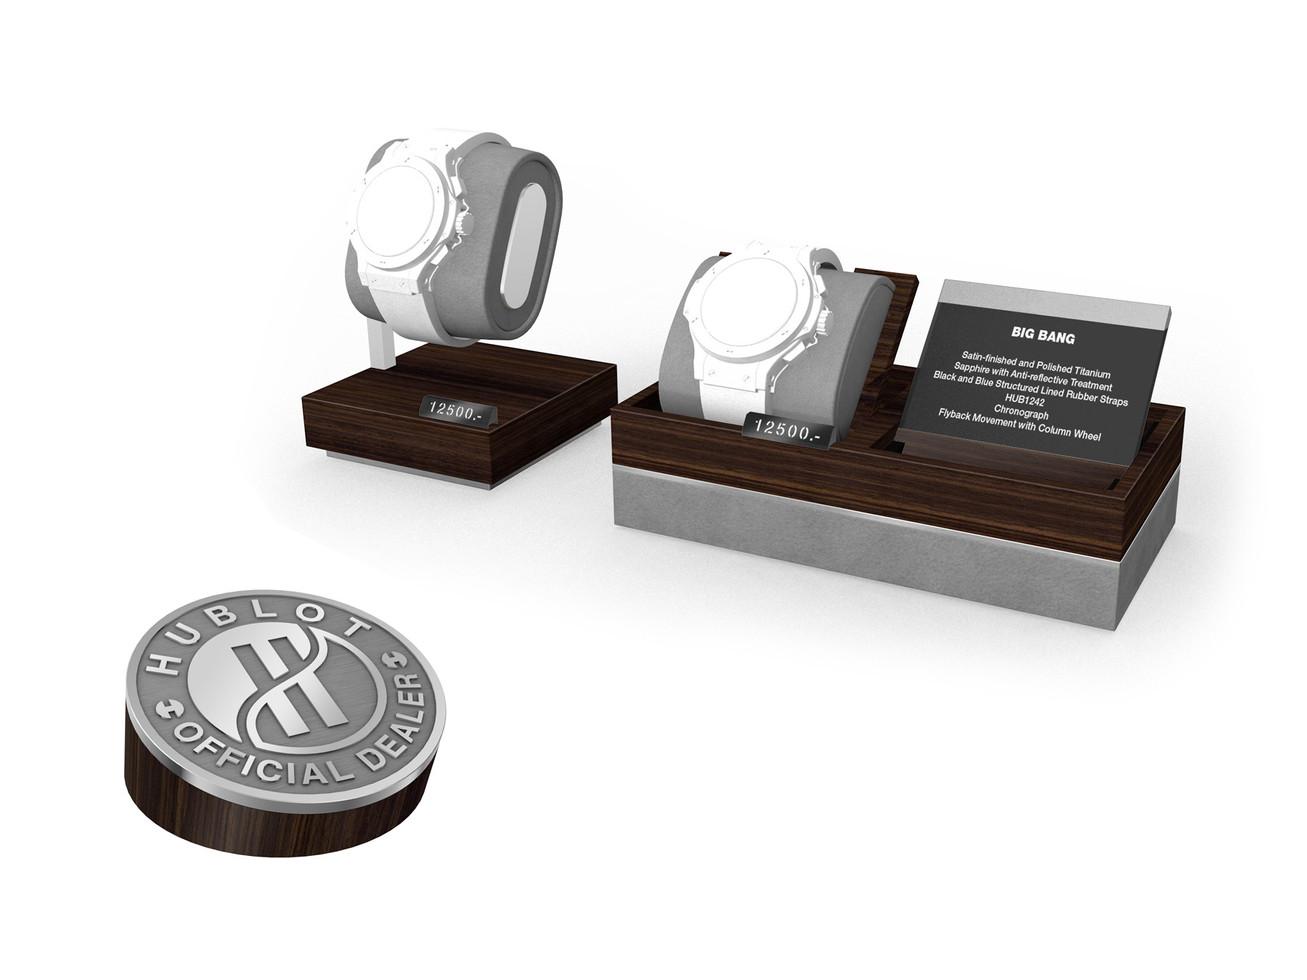 Display Concept - Generation 3  - Watch Holder concept & Official Dealer plate